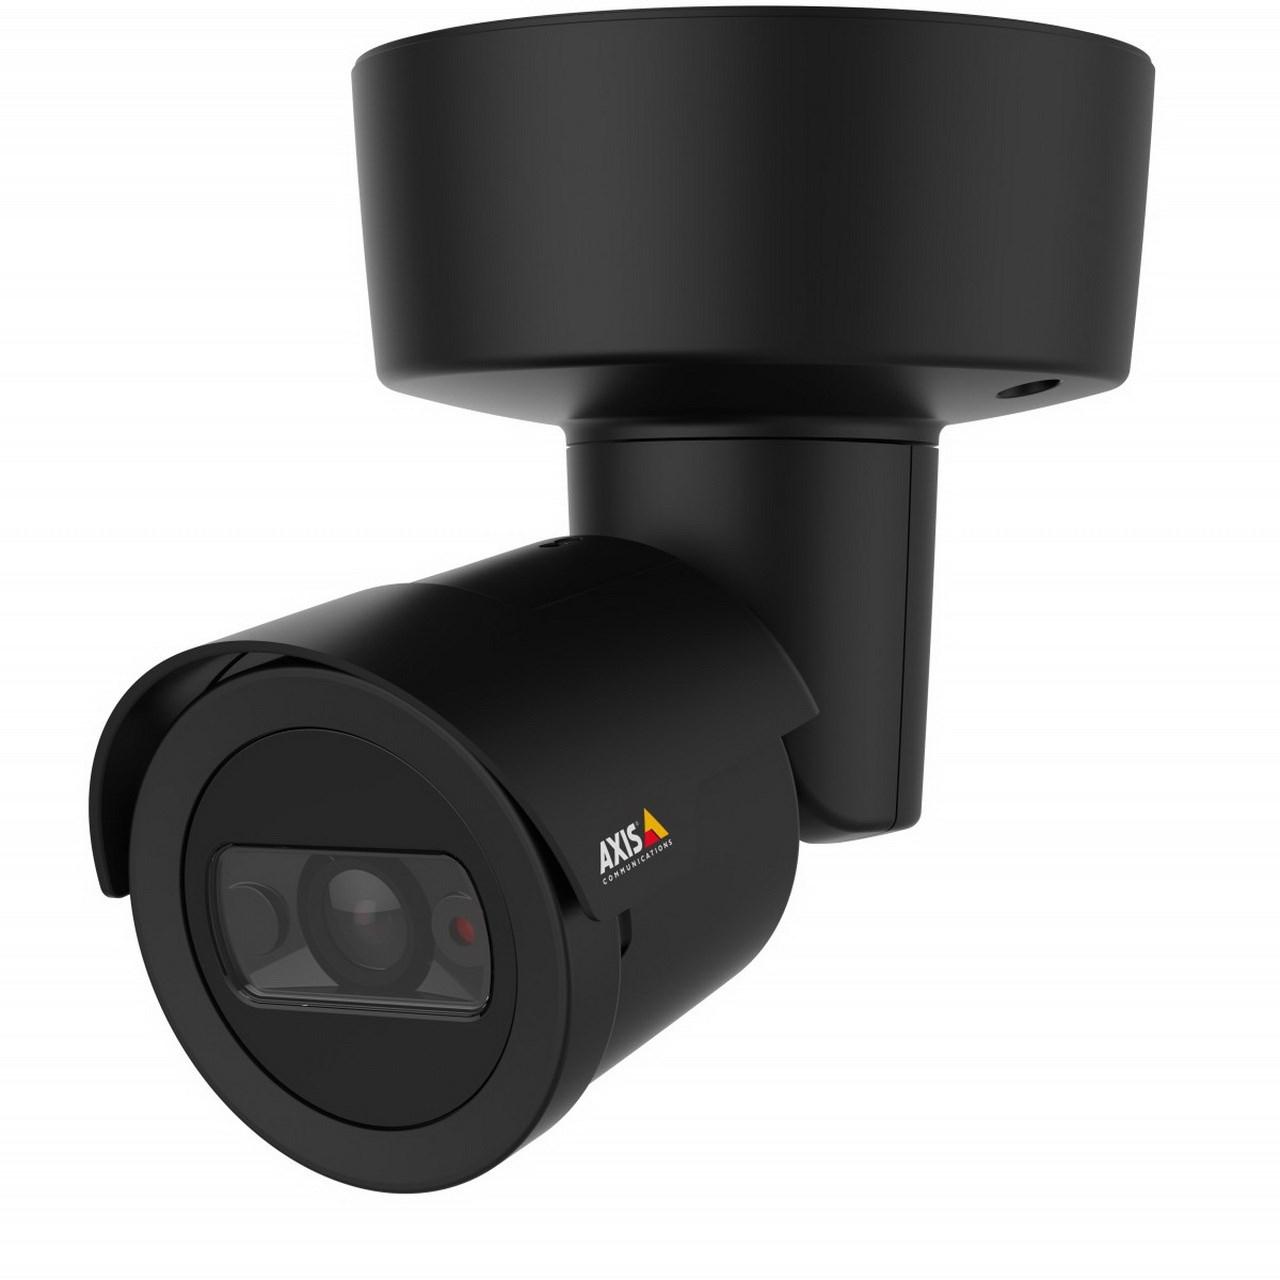 تصویر دوربین مداربسته اکسیس مدل M2026-LE AXIS  M2026-LE Network Camera